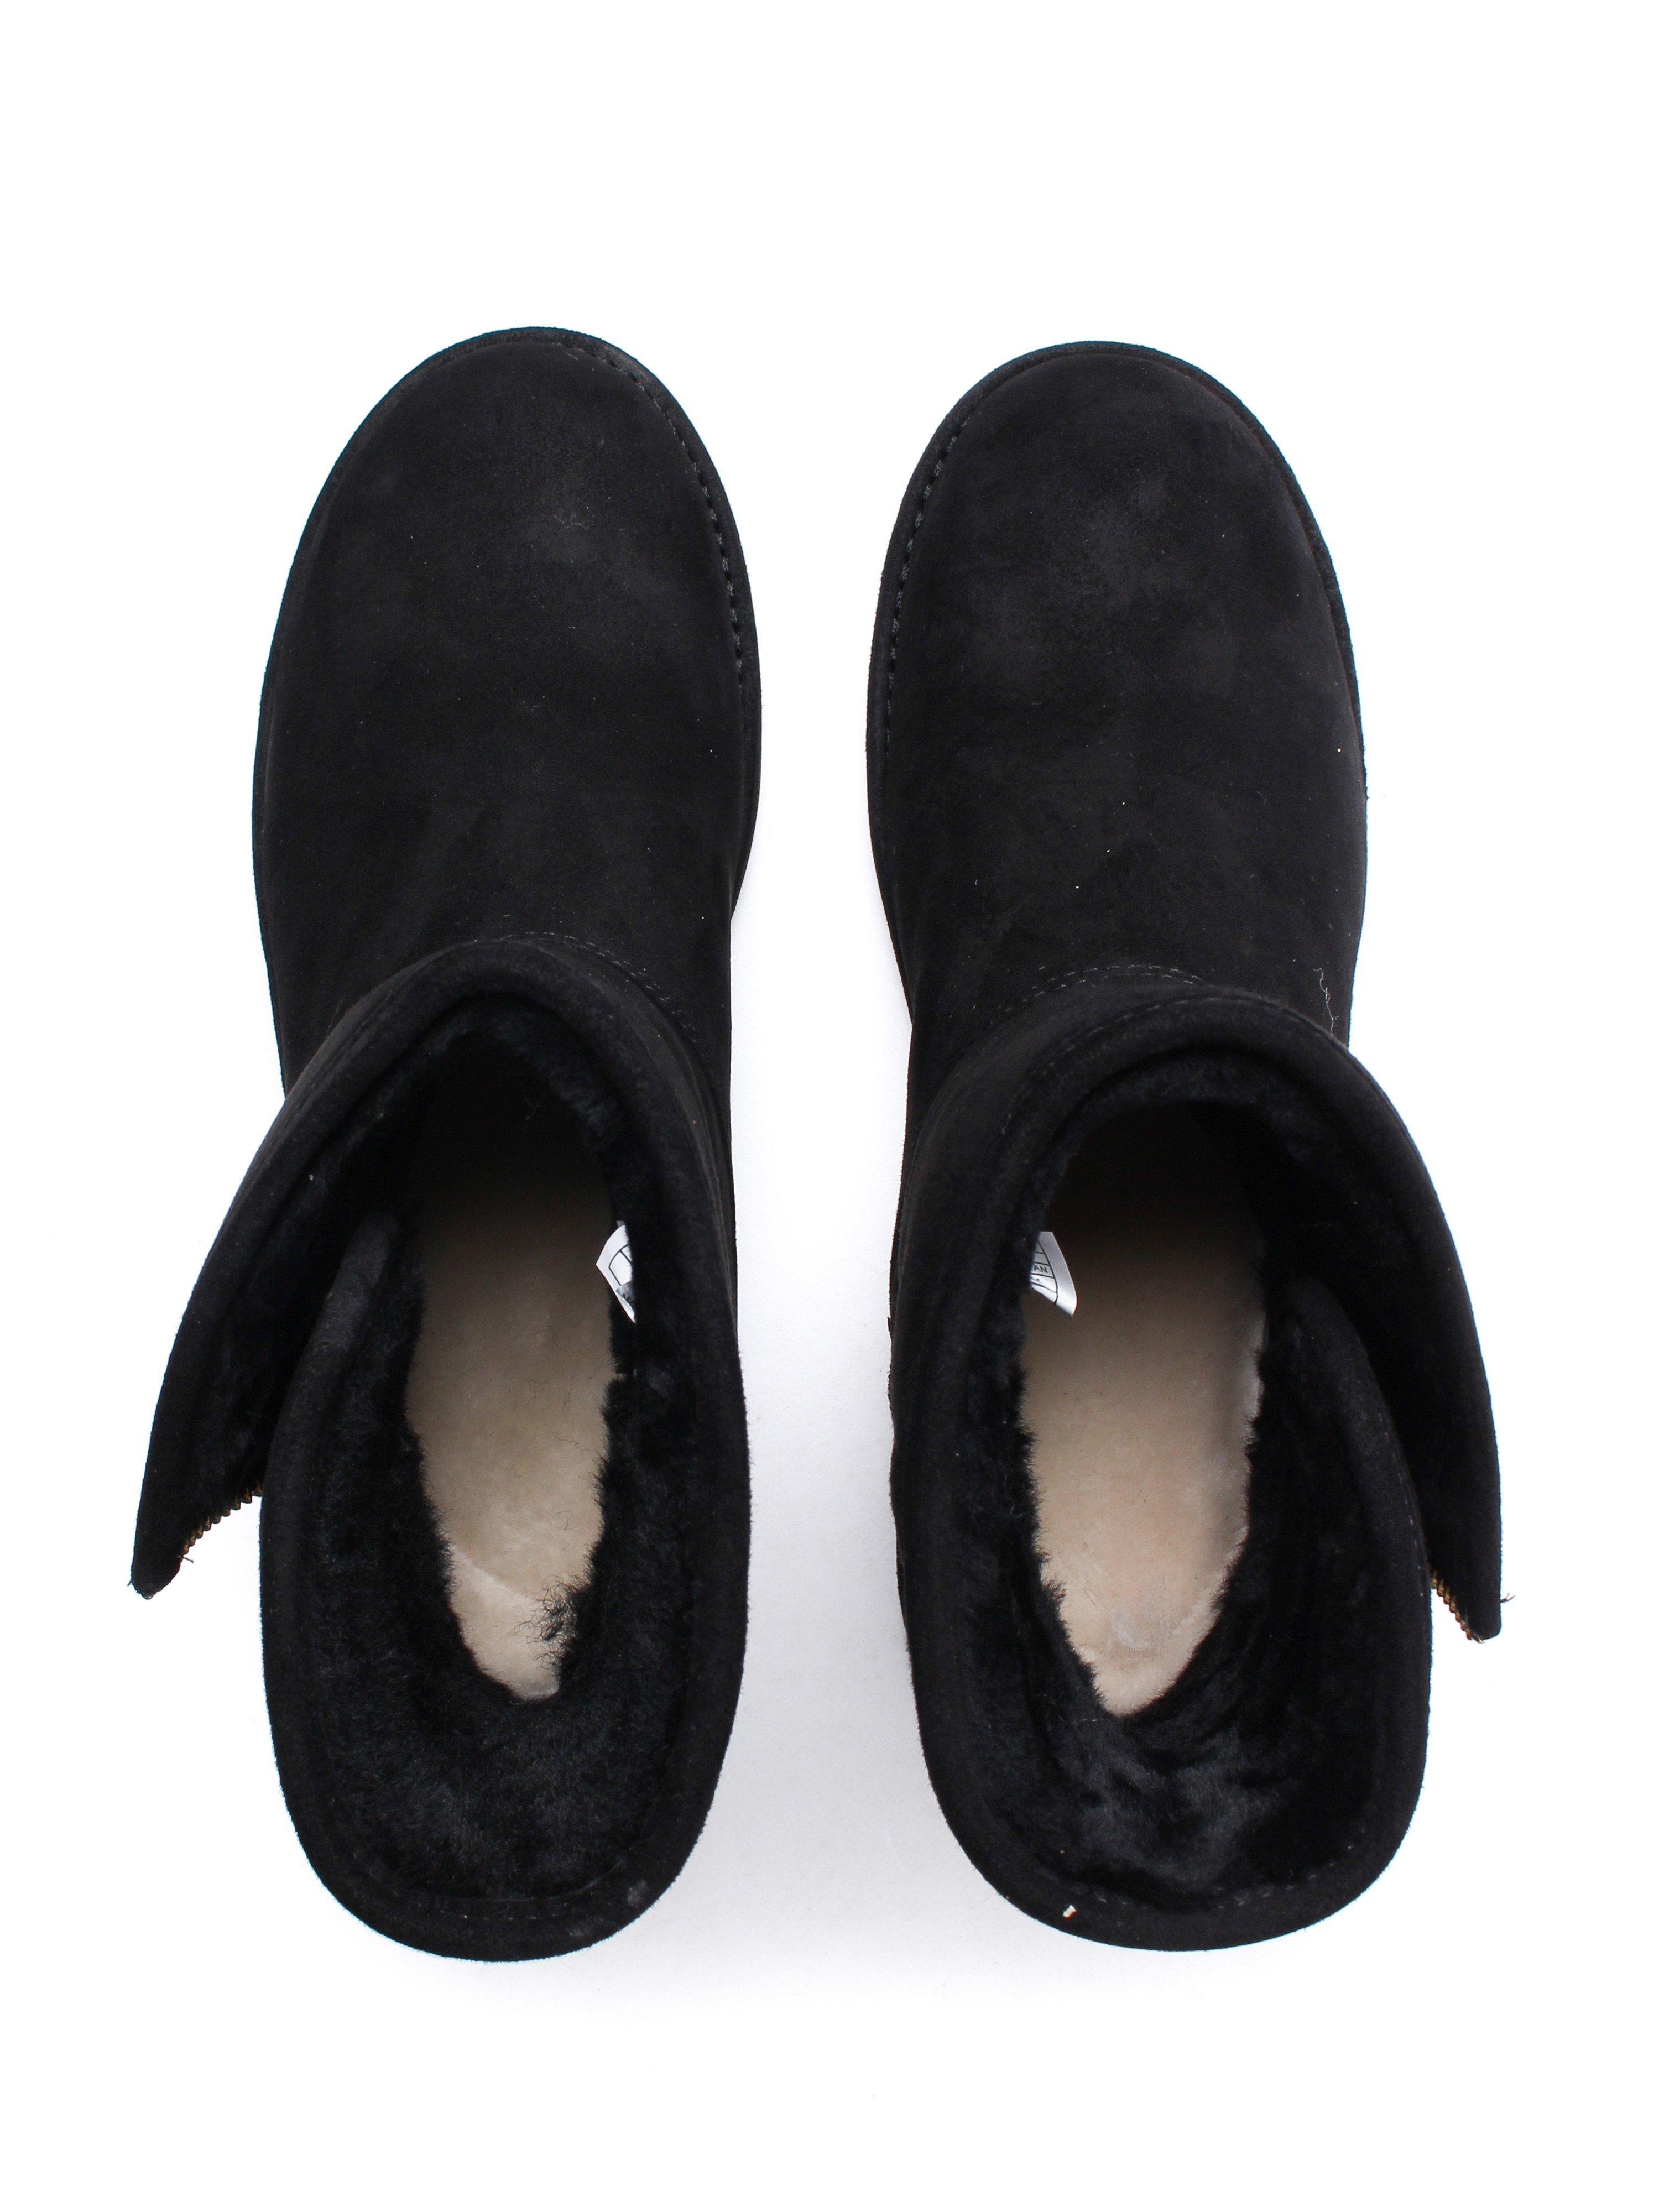 UGG Women's Kip Mid Boots - Black Suede